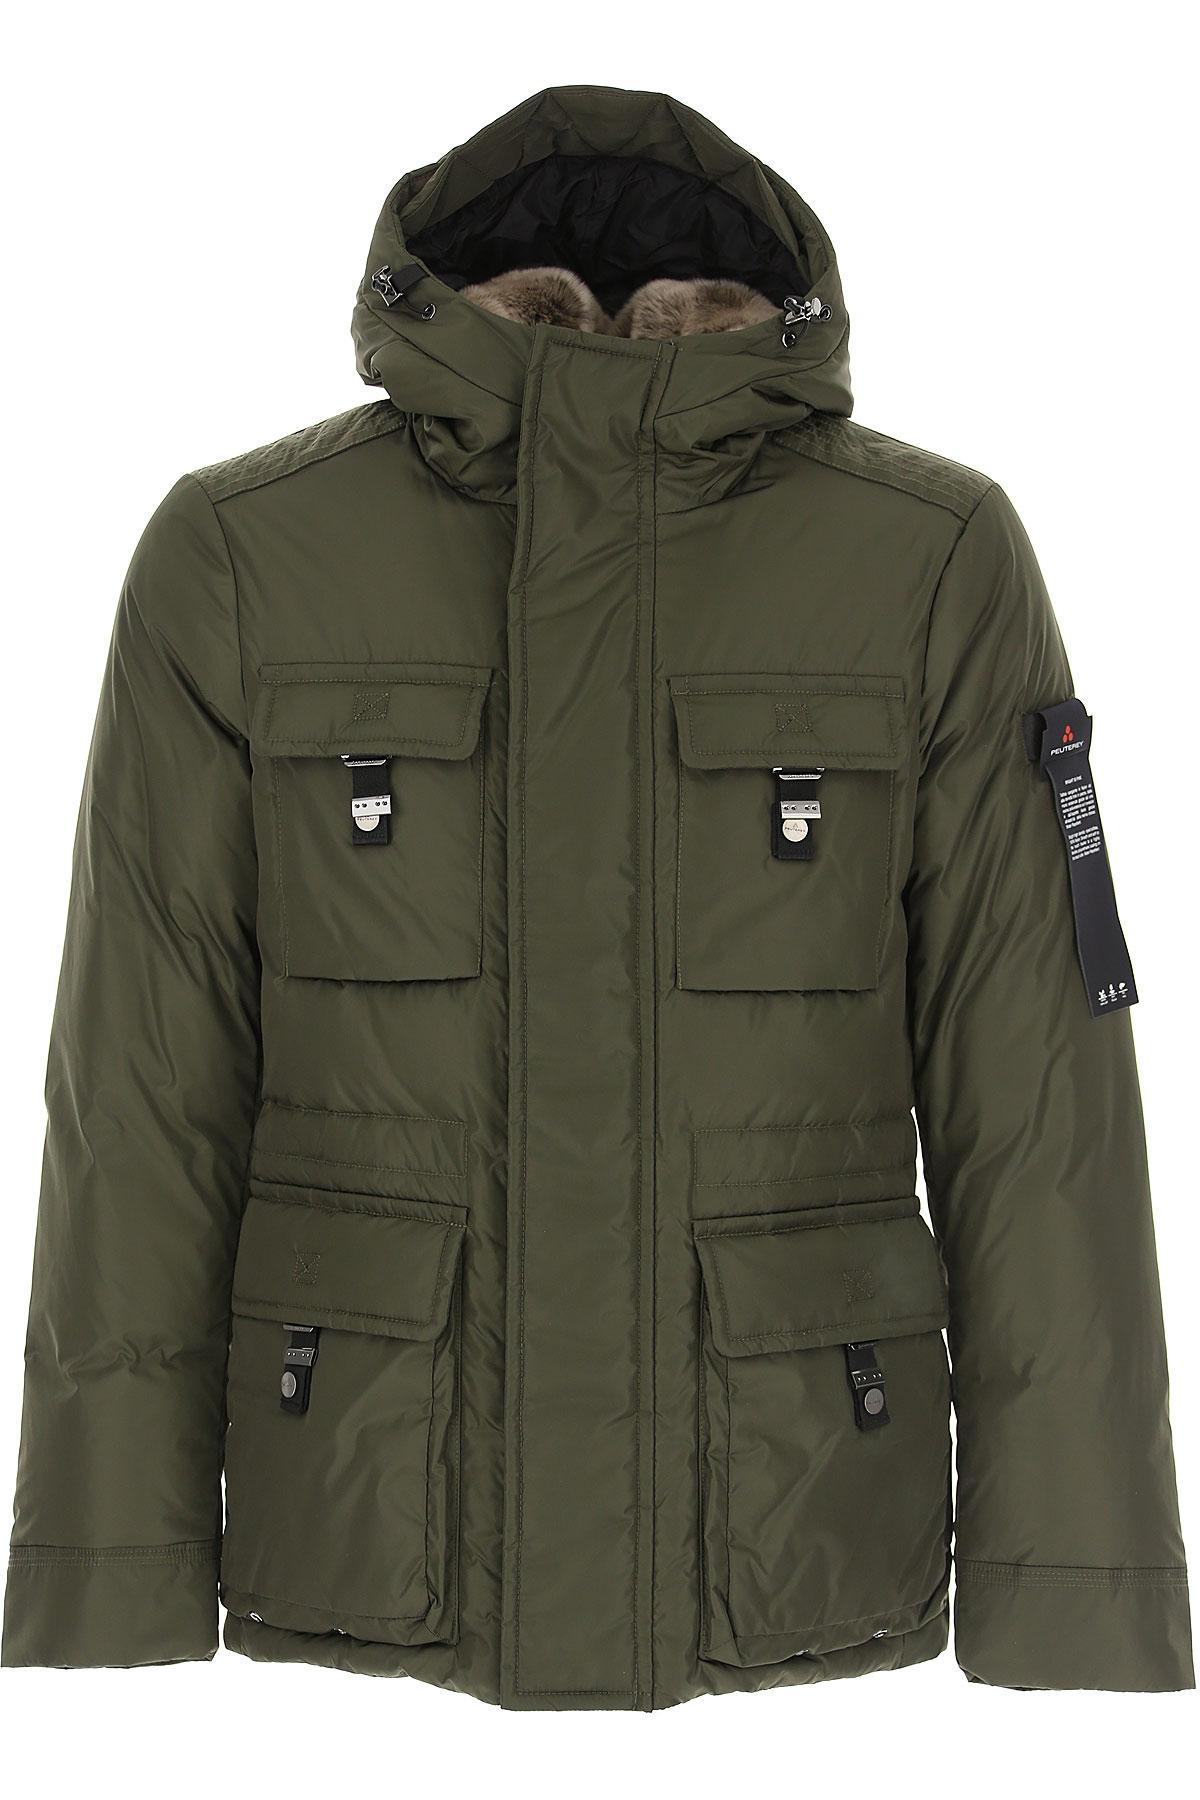 Peuterey Down Jacket for Men, Puffer Ski Jacket On Sale, Dark Military Green, Down, 2019, L XL